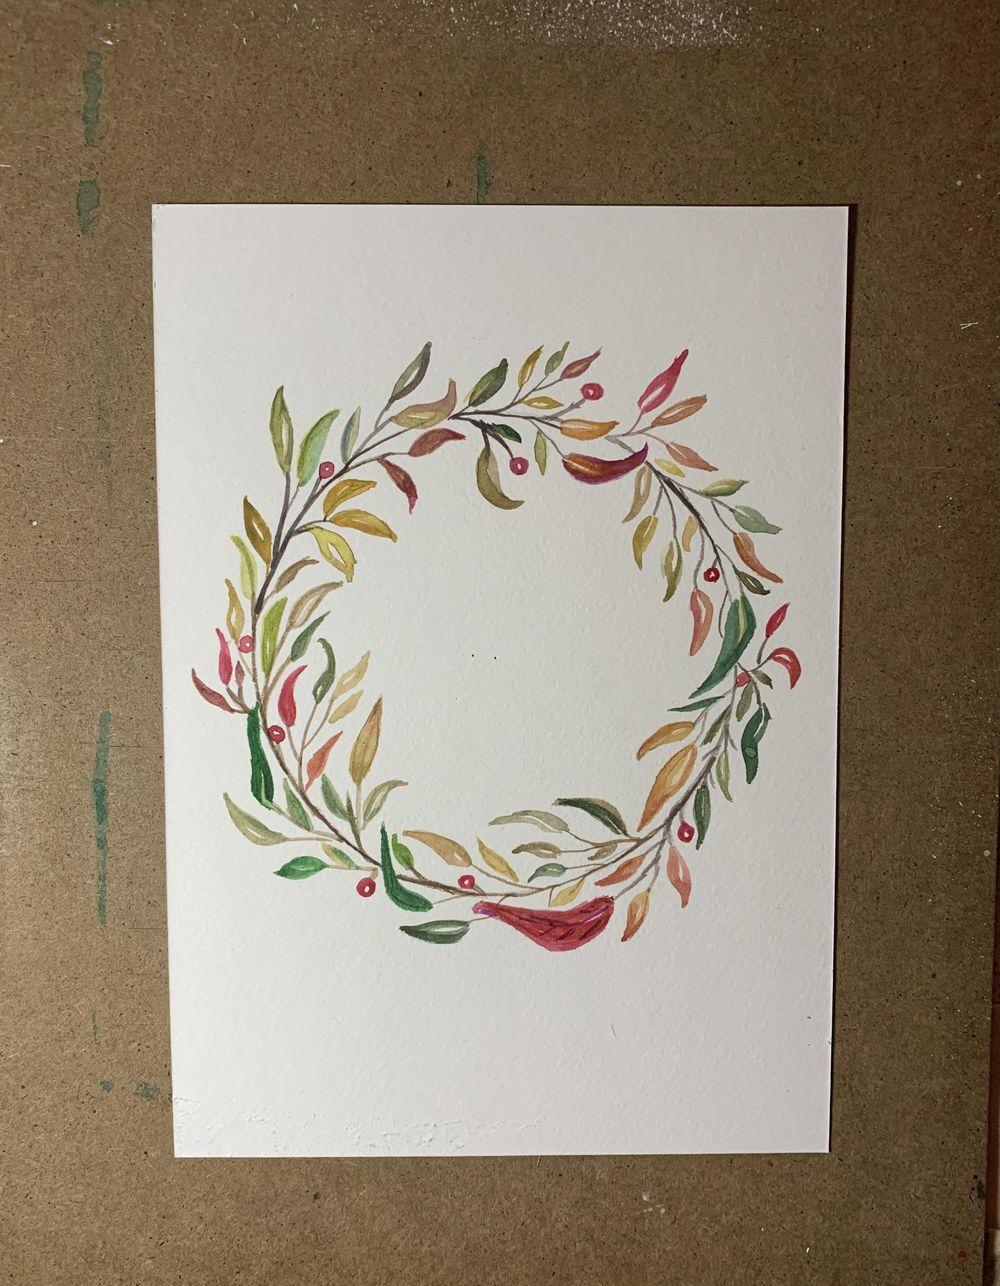 Corona de hojas - image 1 - student project